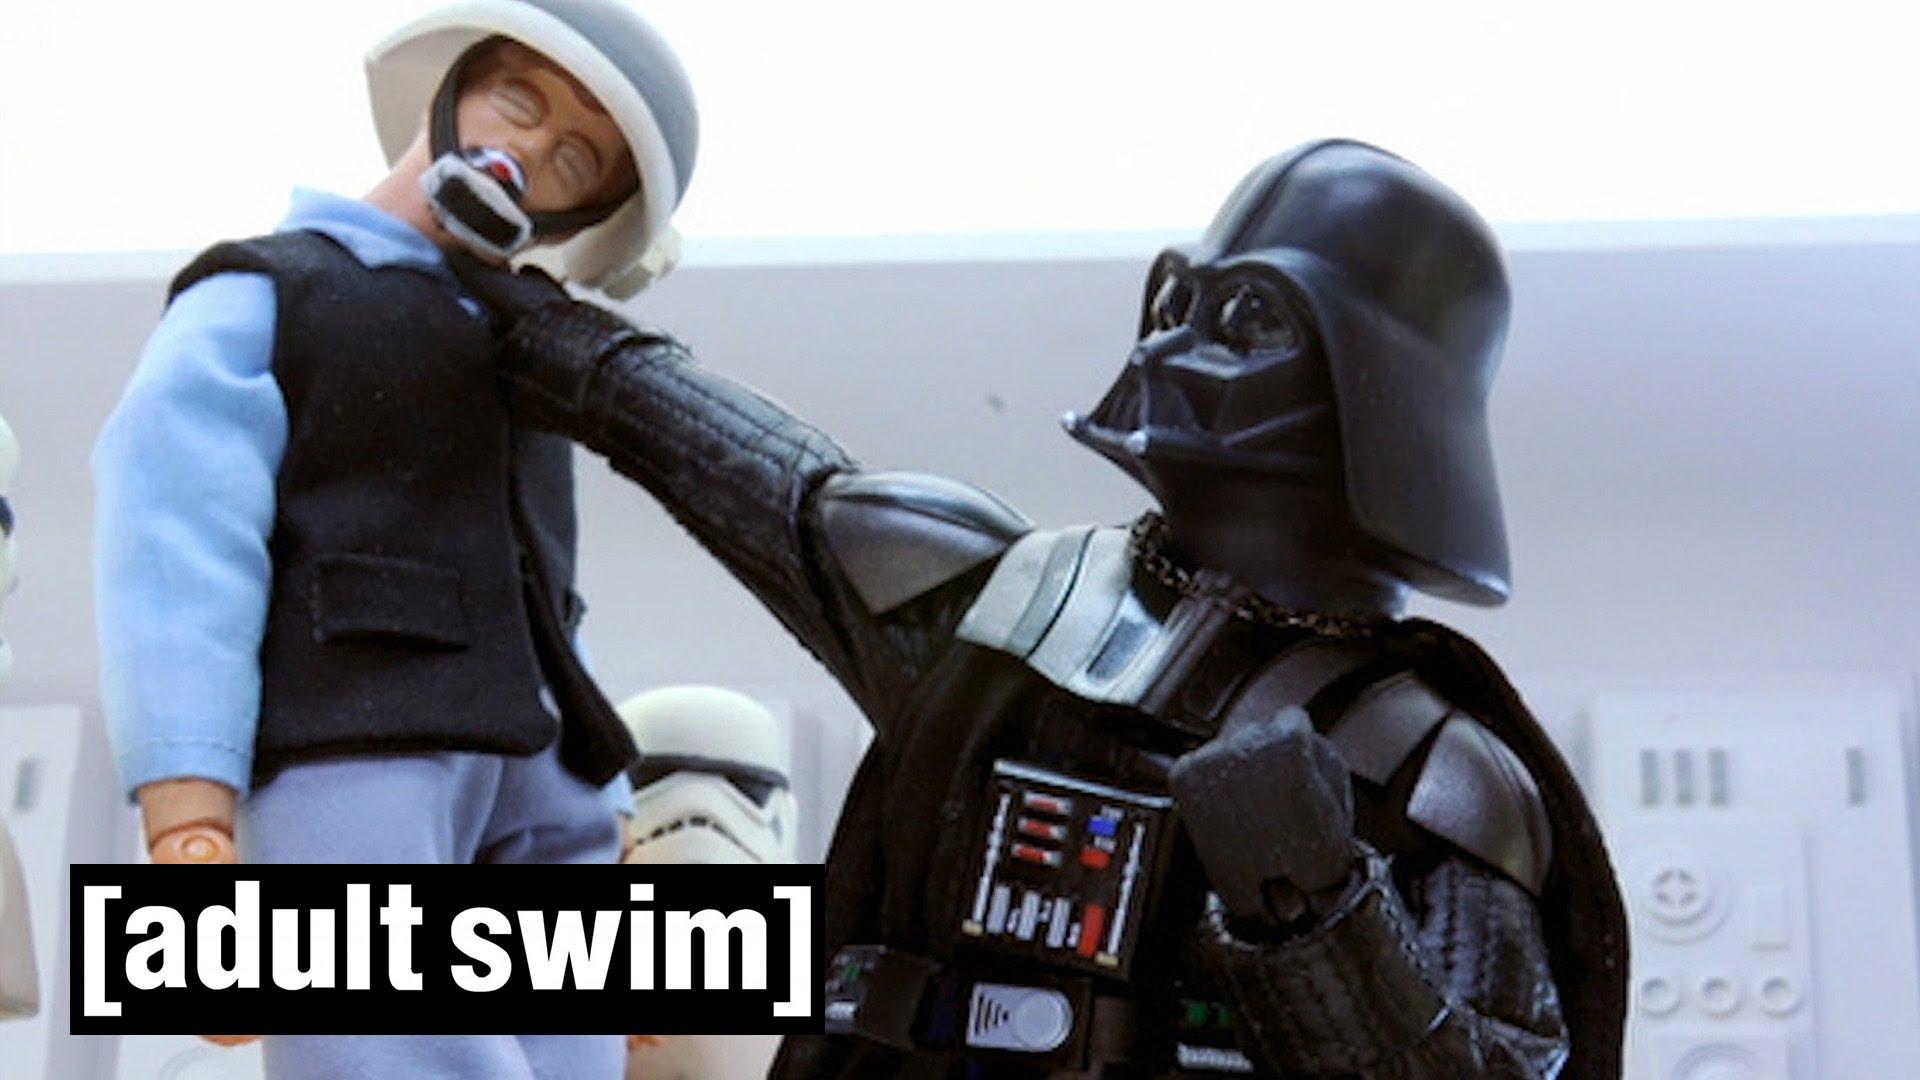 Adult swim starwars xxx vids